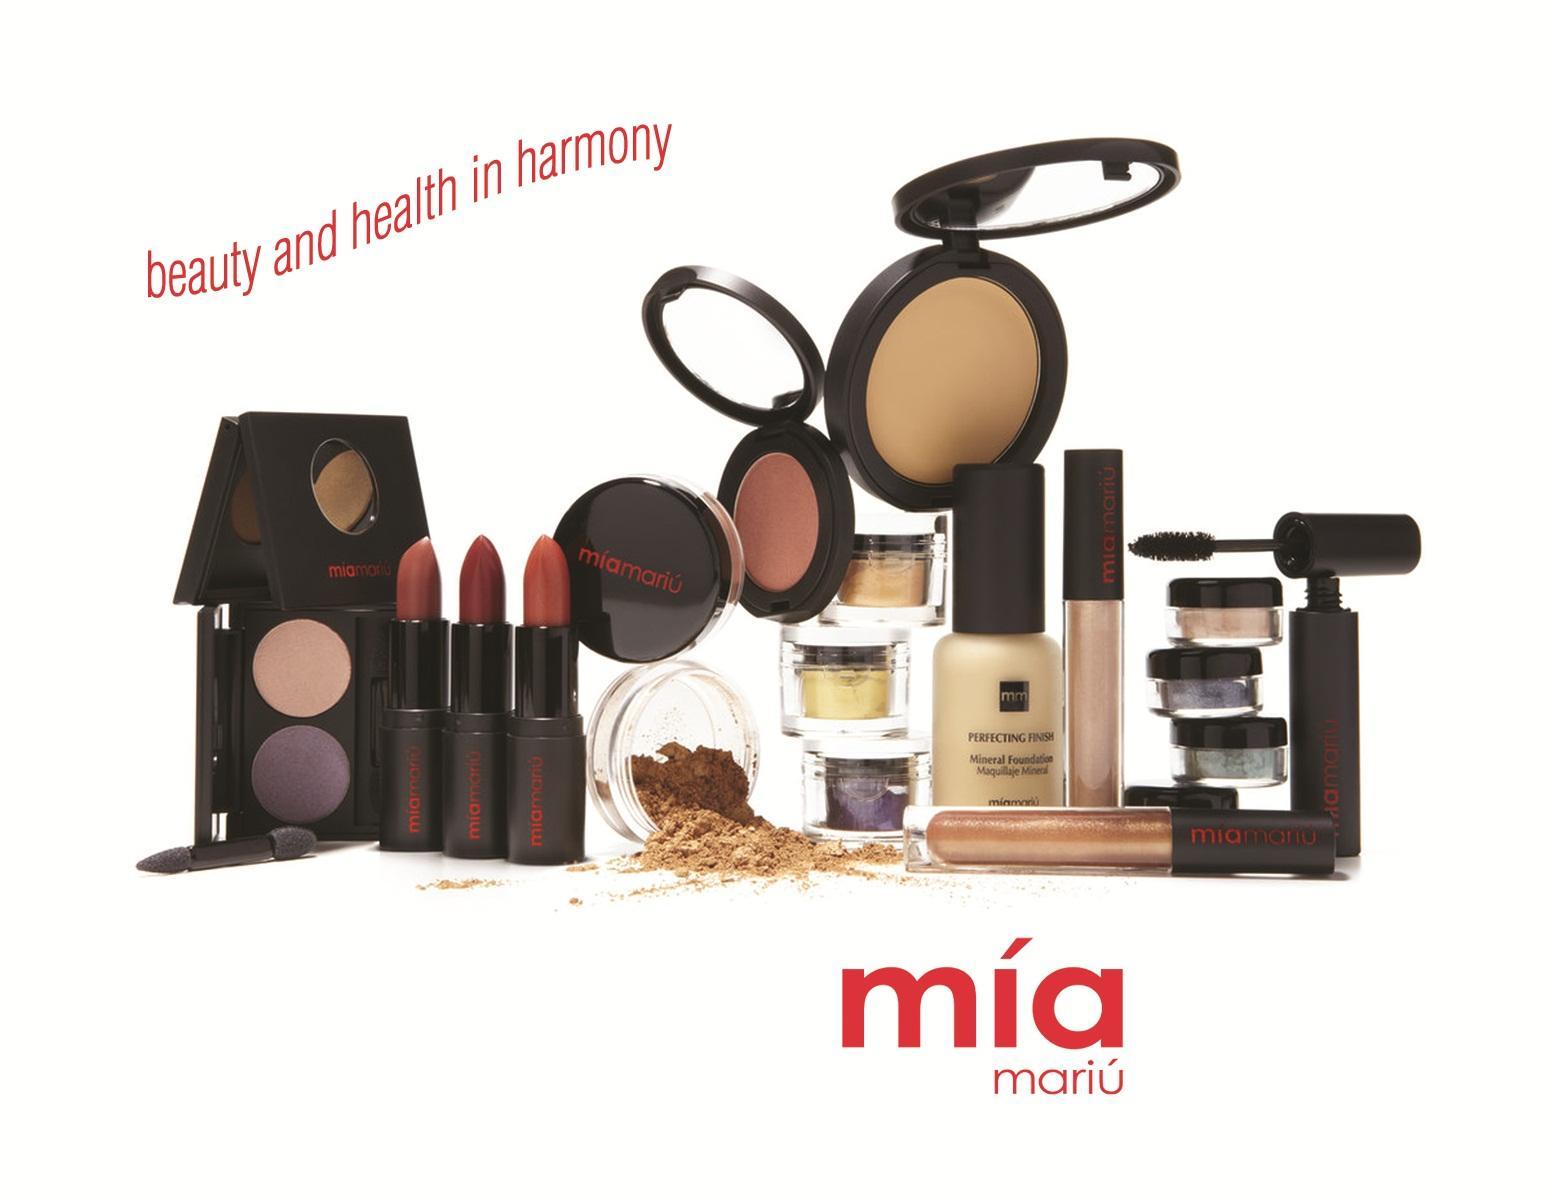 Mia_Mariu_Beauty_Giveaway